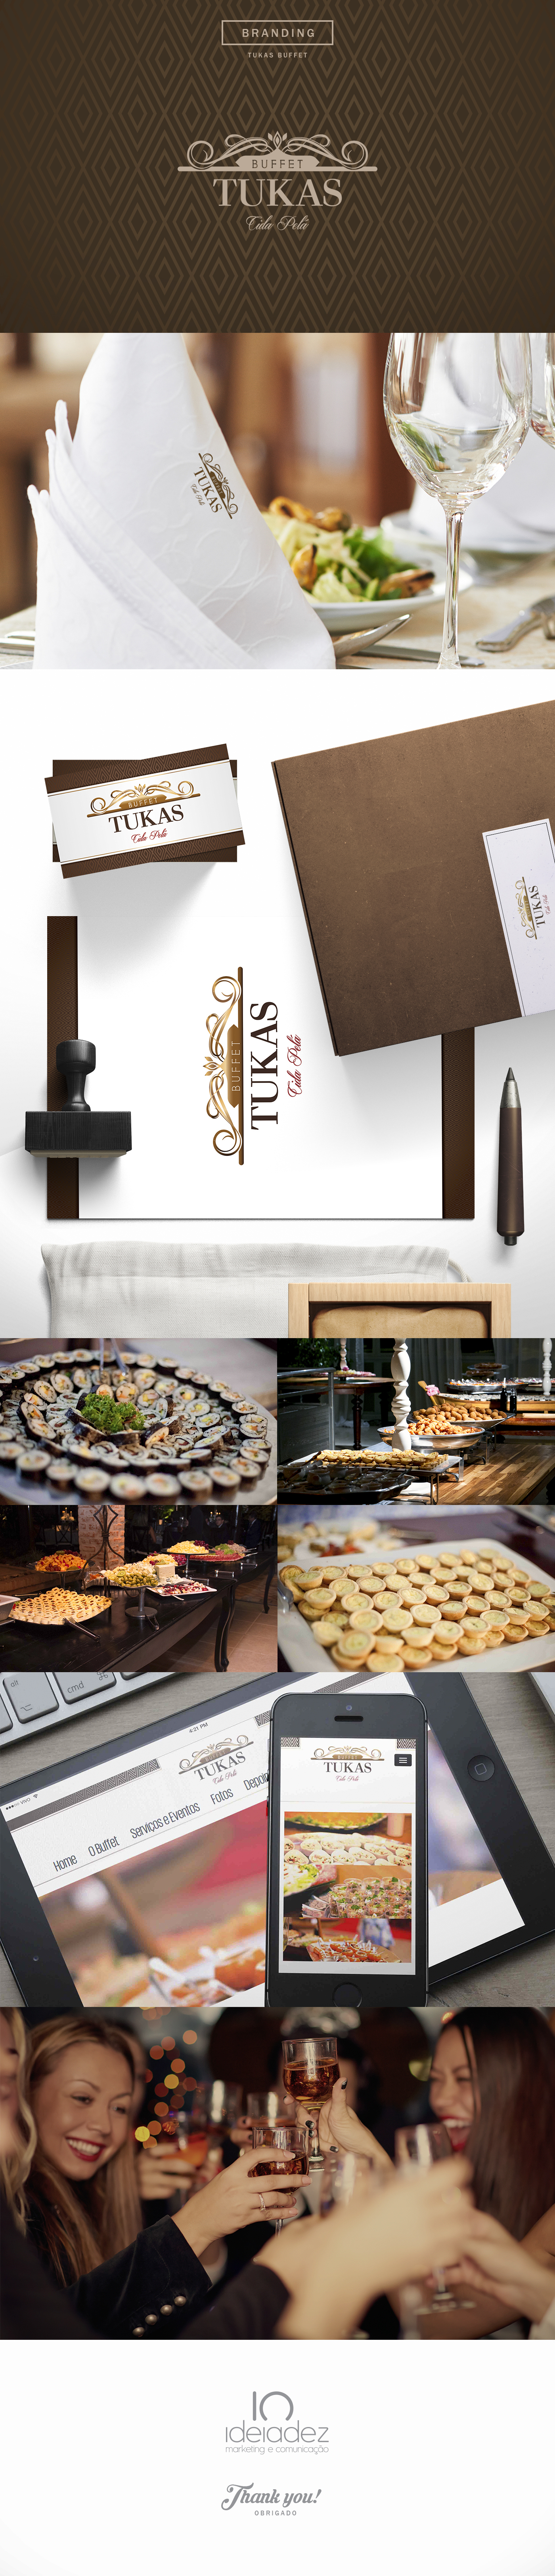 buffet fooddesign brandingdesign Mockup mockupdesign